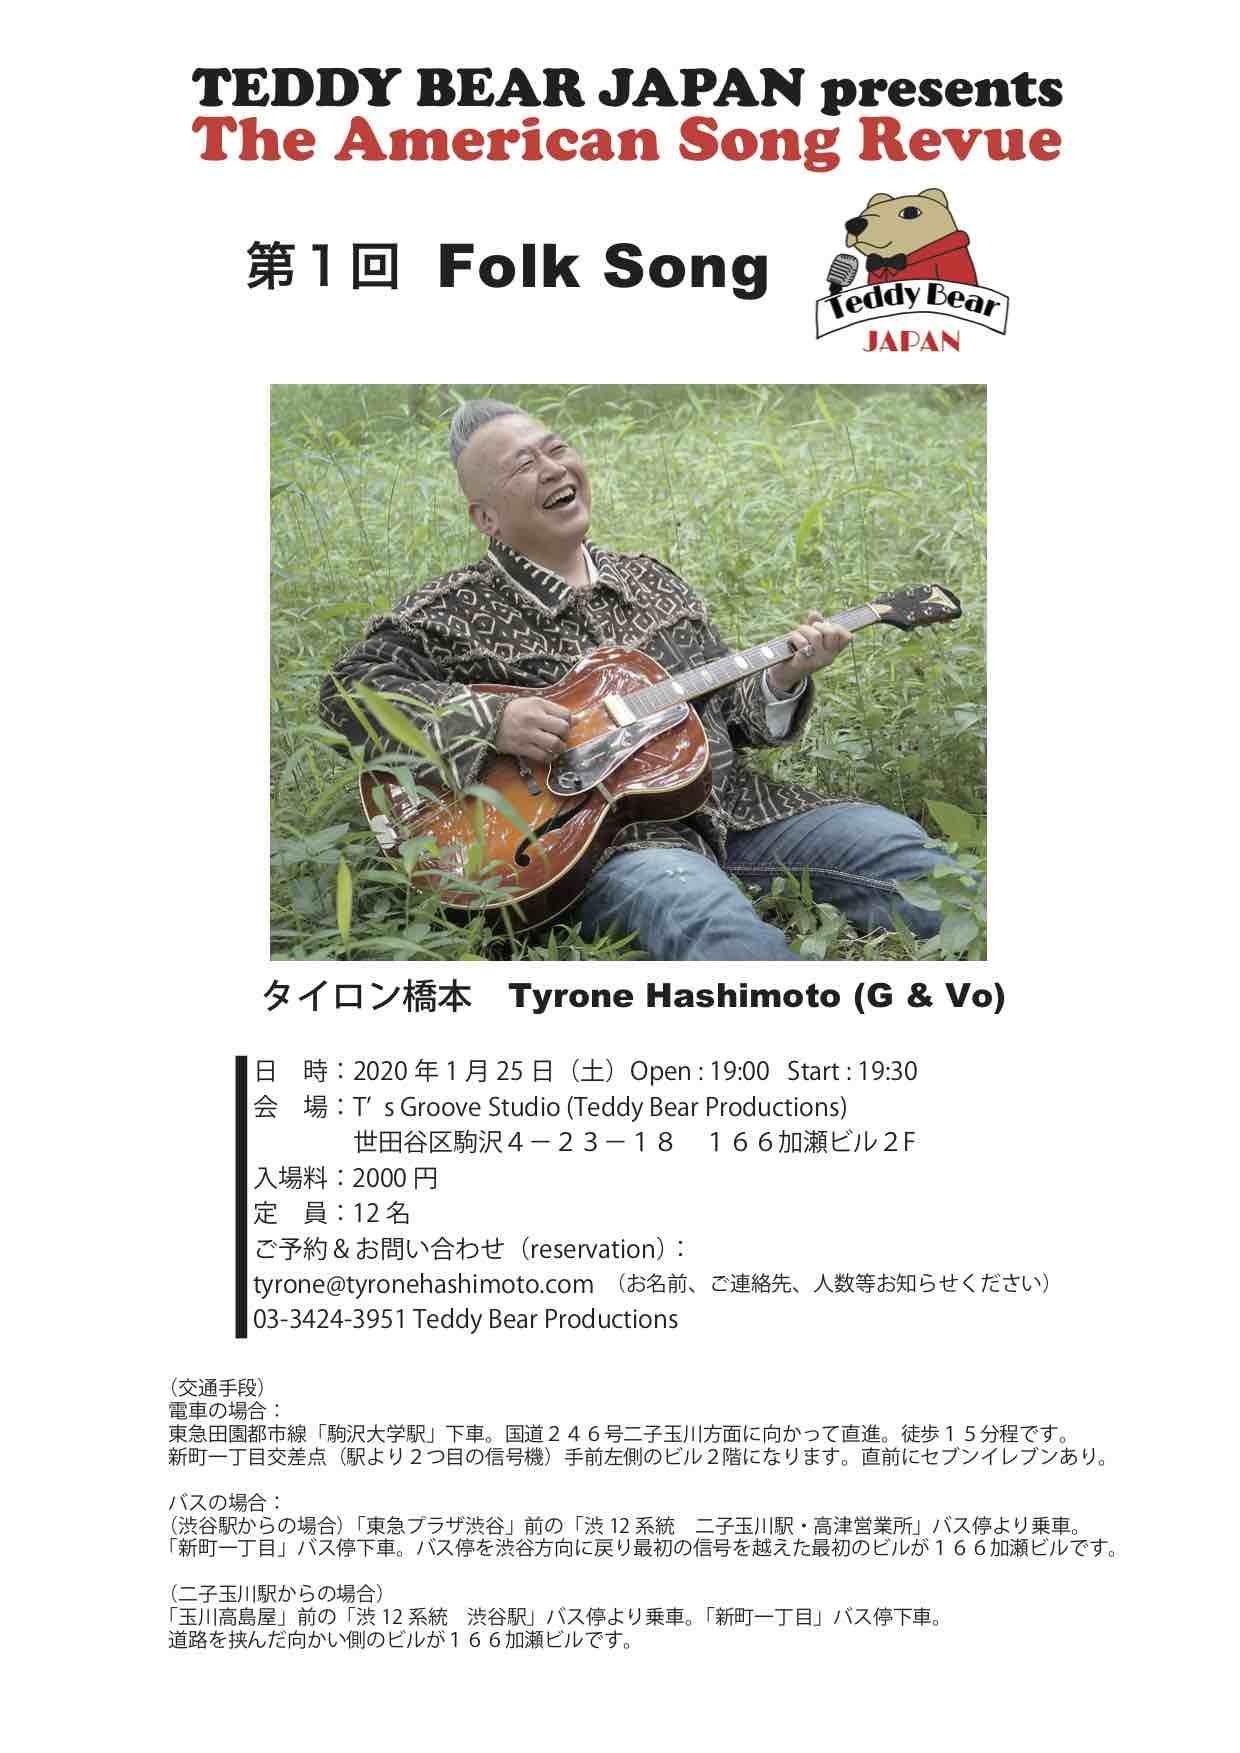 Tyrone Hashimoto 1月 ライブ情報_c0368808_19170240.jpg